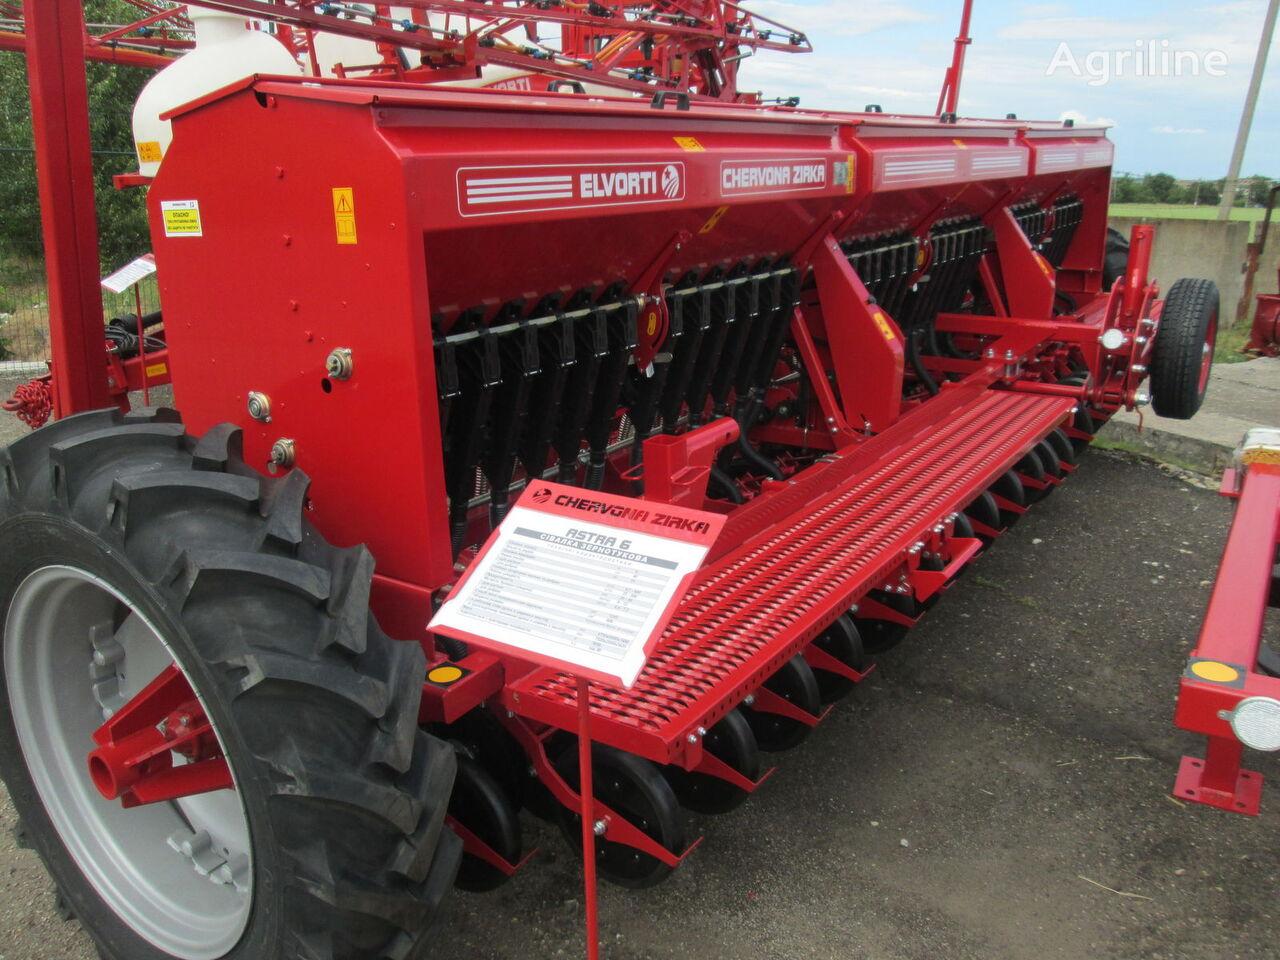 new ELVORTI (CHERVONA ZIRKA) SZ 3,6 / 4 / 5,4 / 6 (Astra Standart / Premium) mechanical seed drill